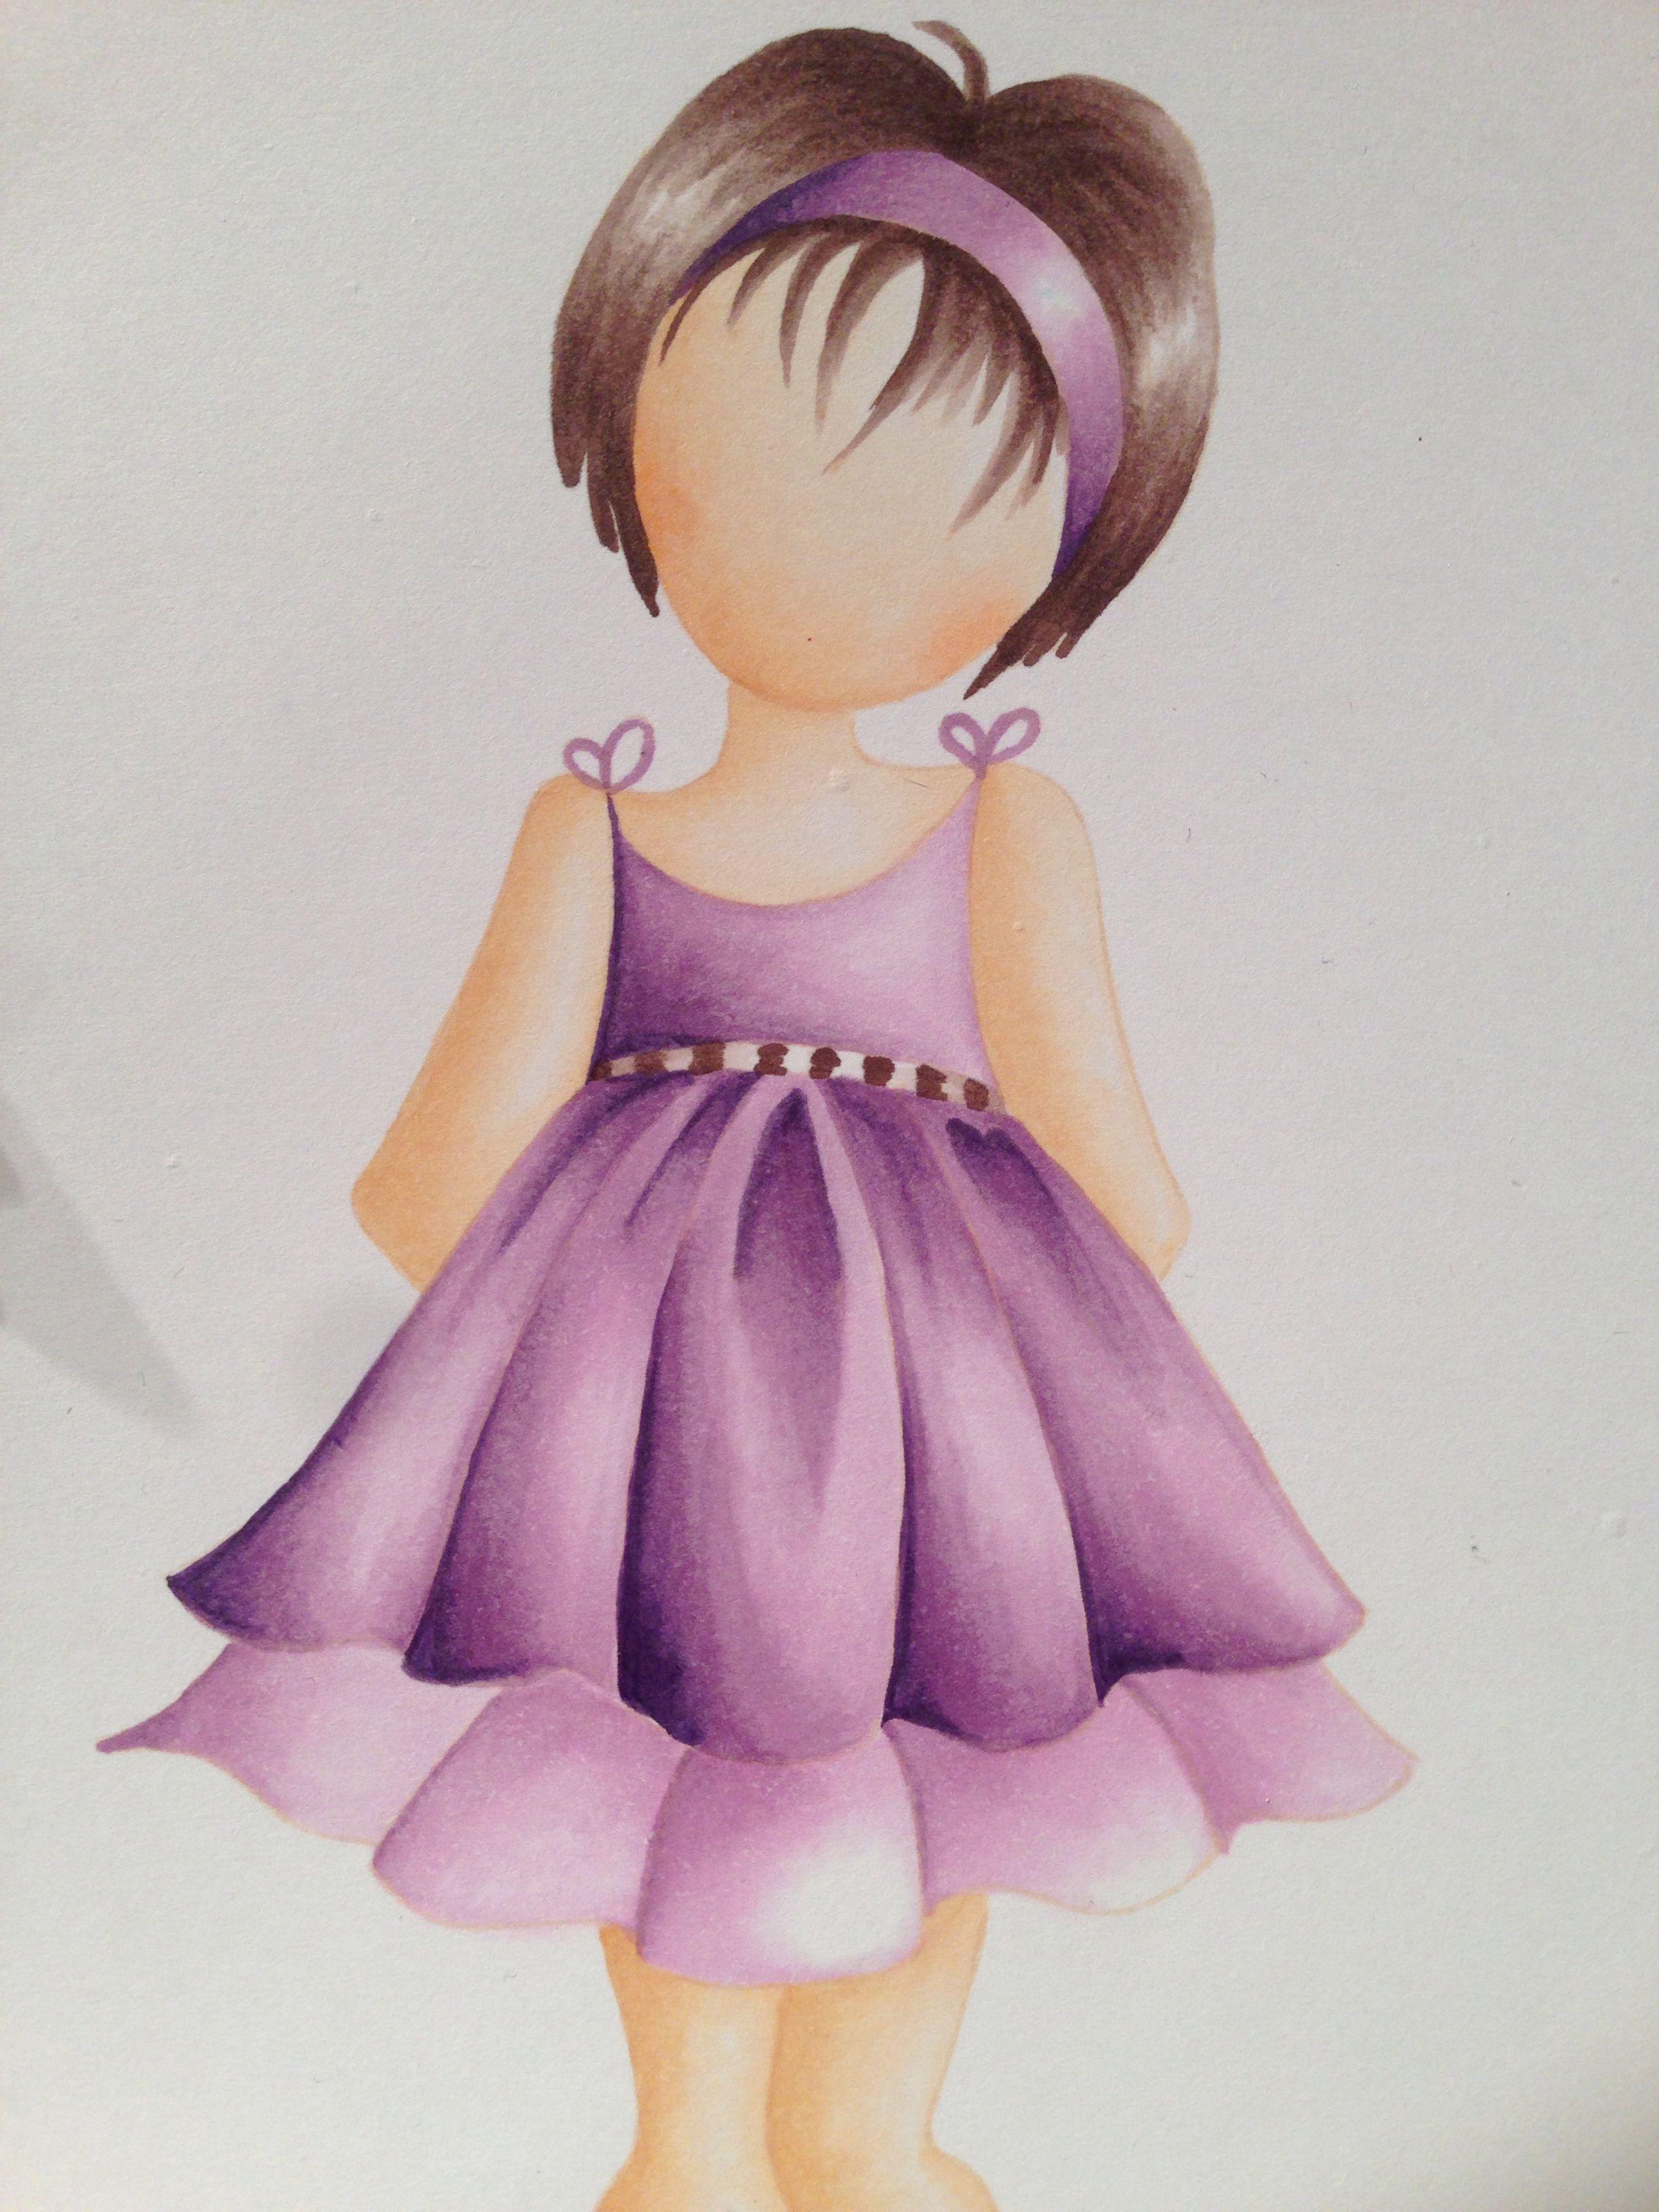 Prima doll coloured with copics By Alexandra Kamann